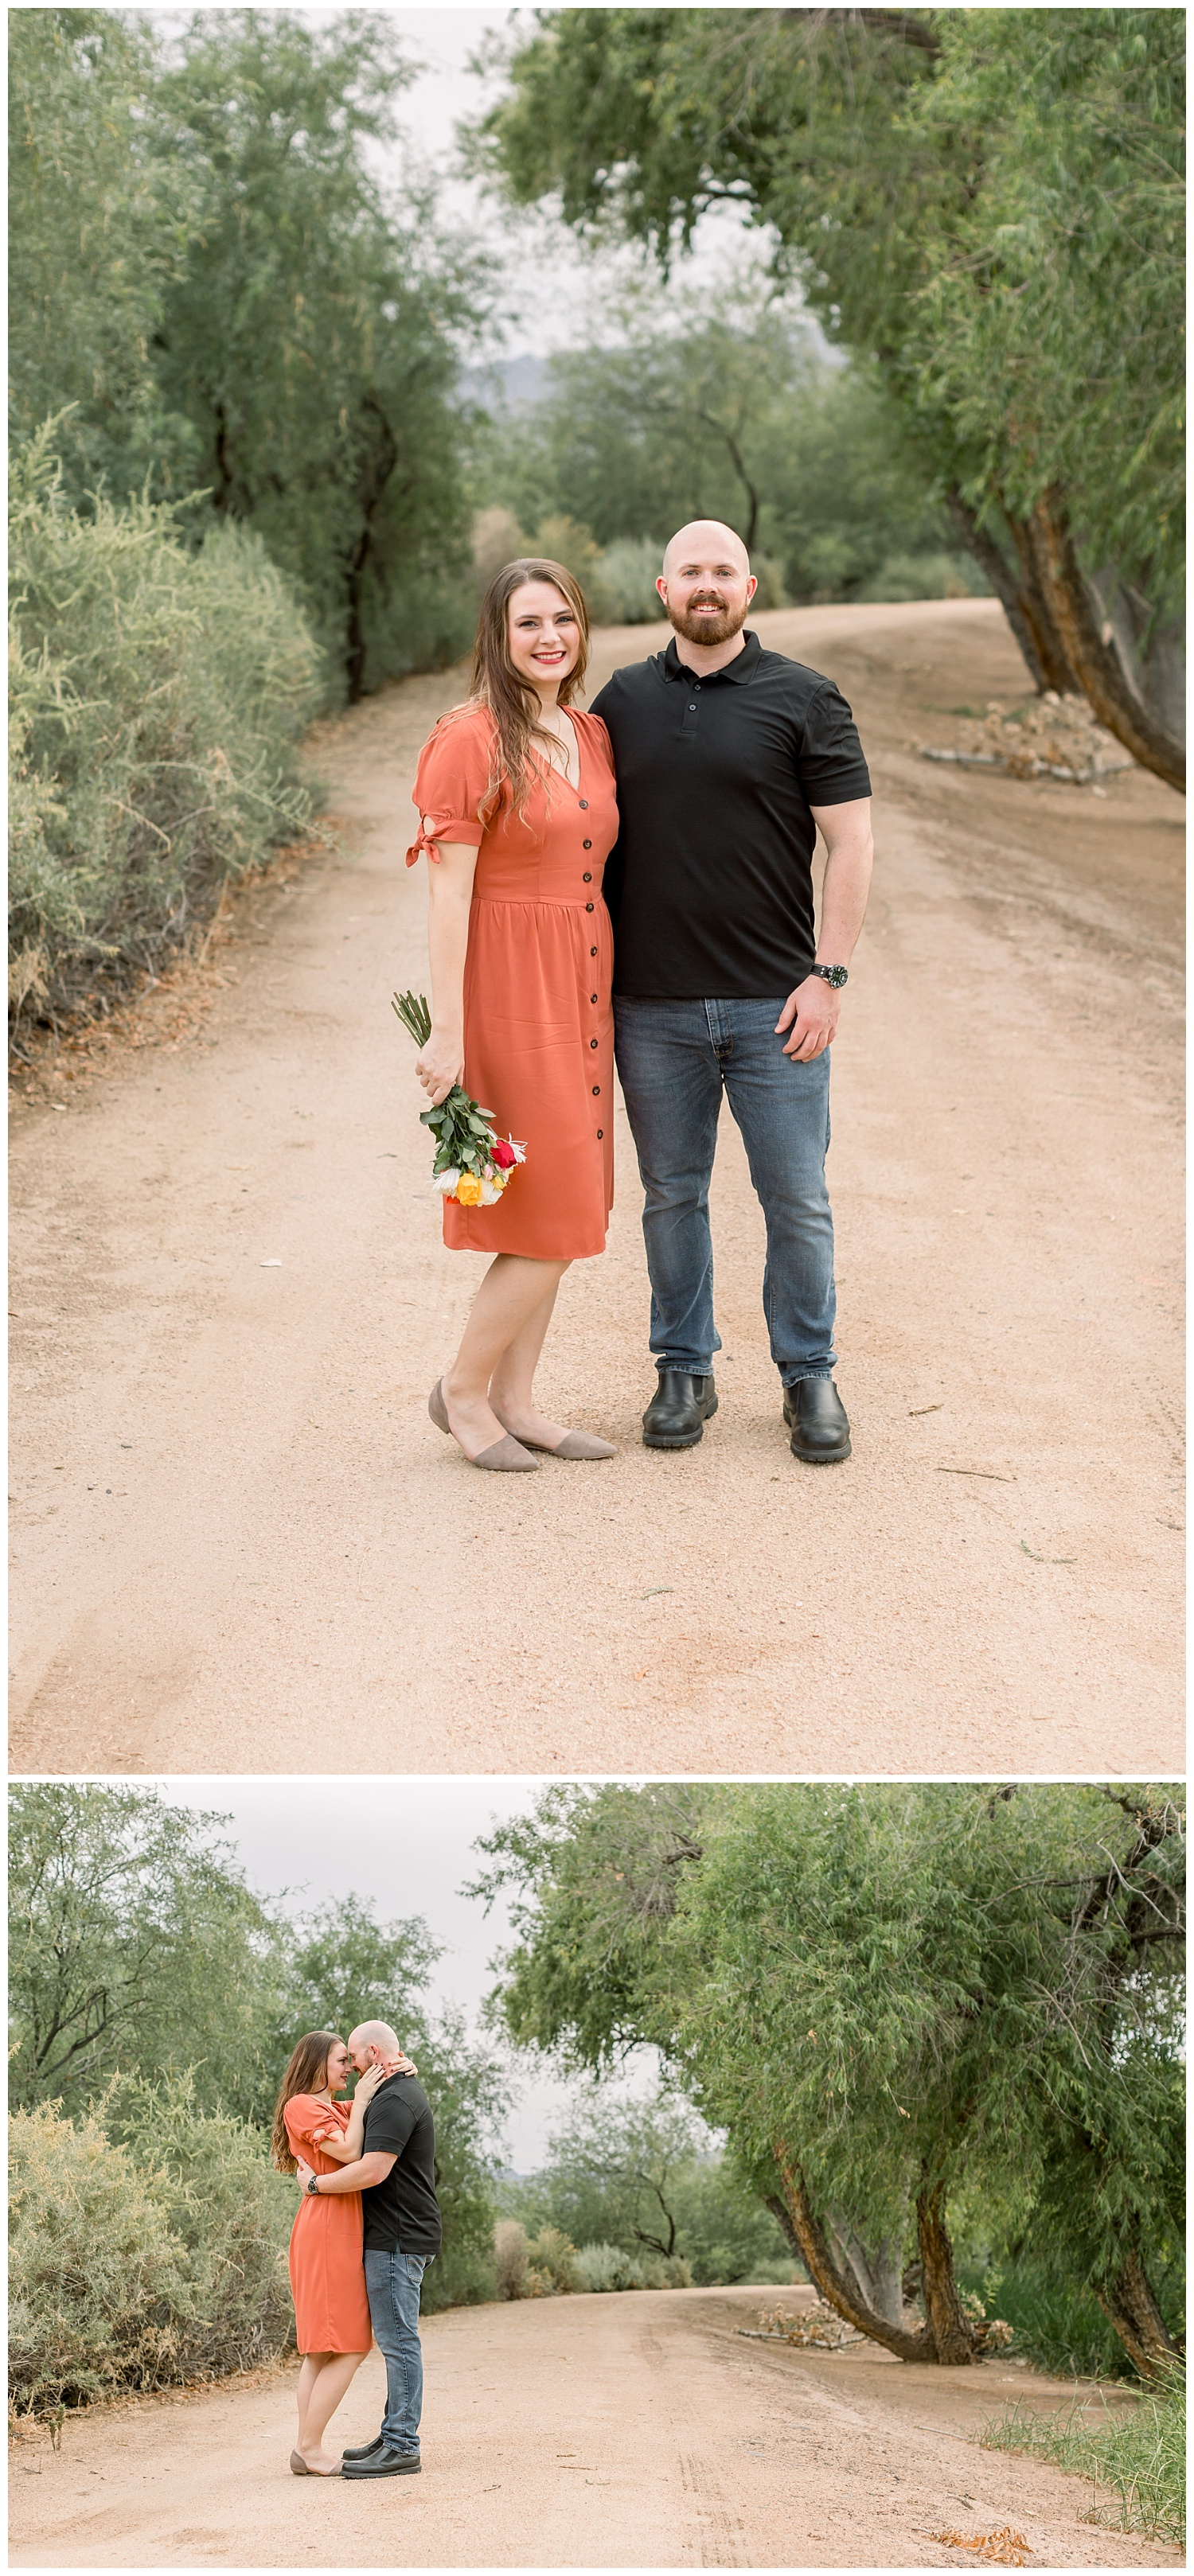 Tucson Engagement Session- KelseyandRyan_0011.jpg